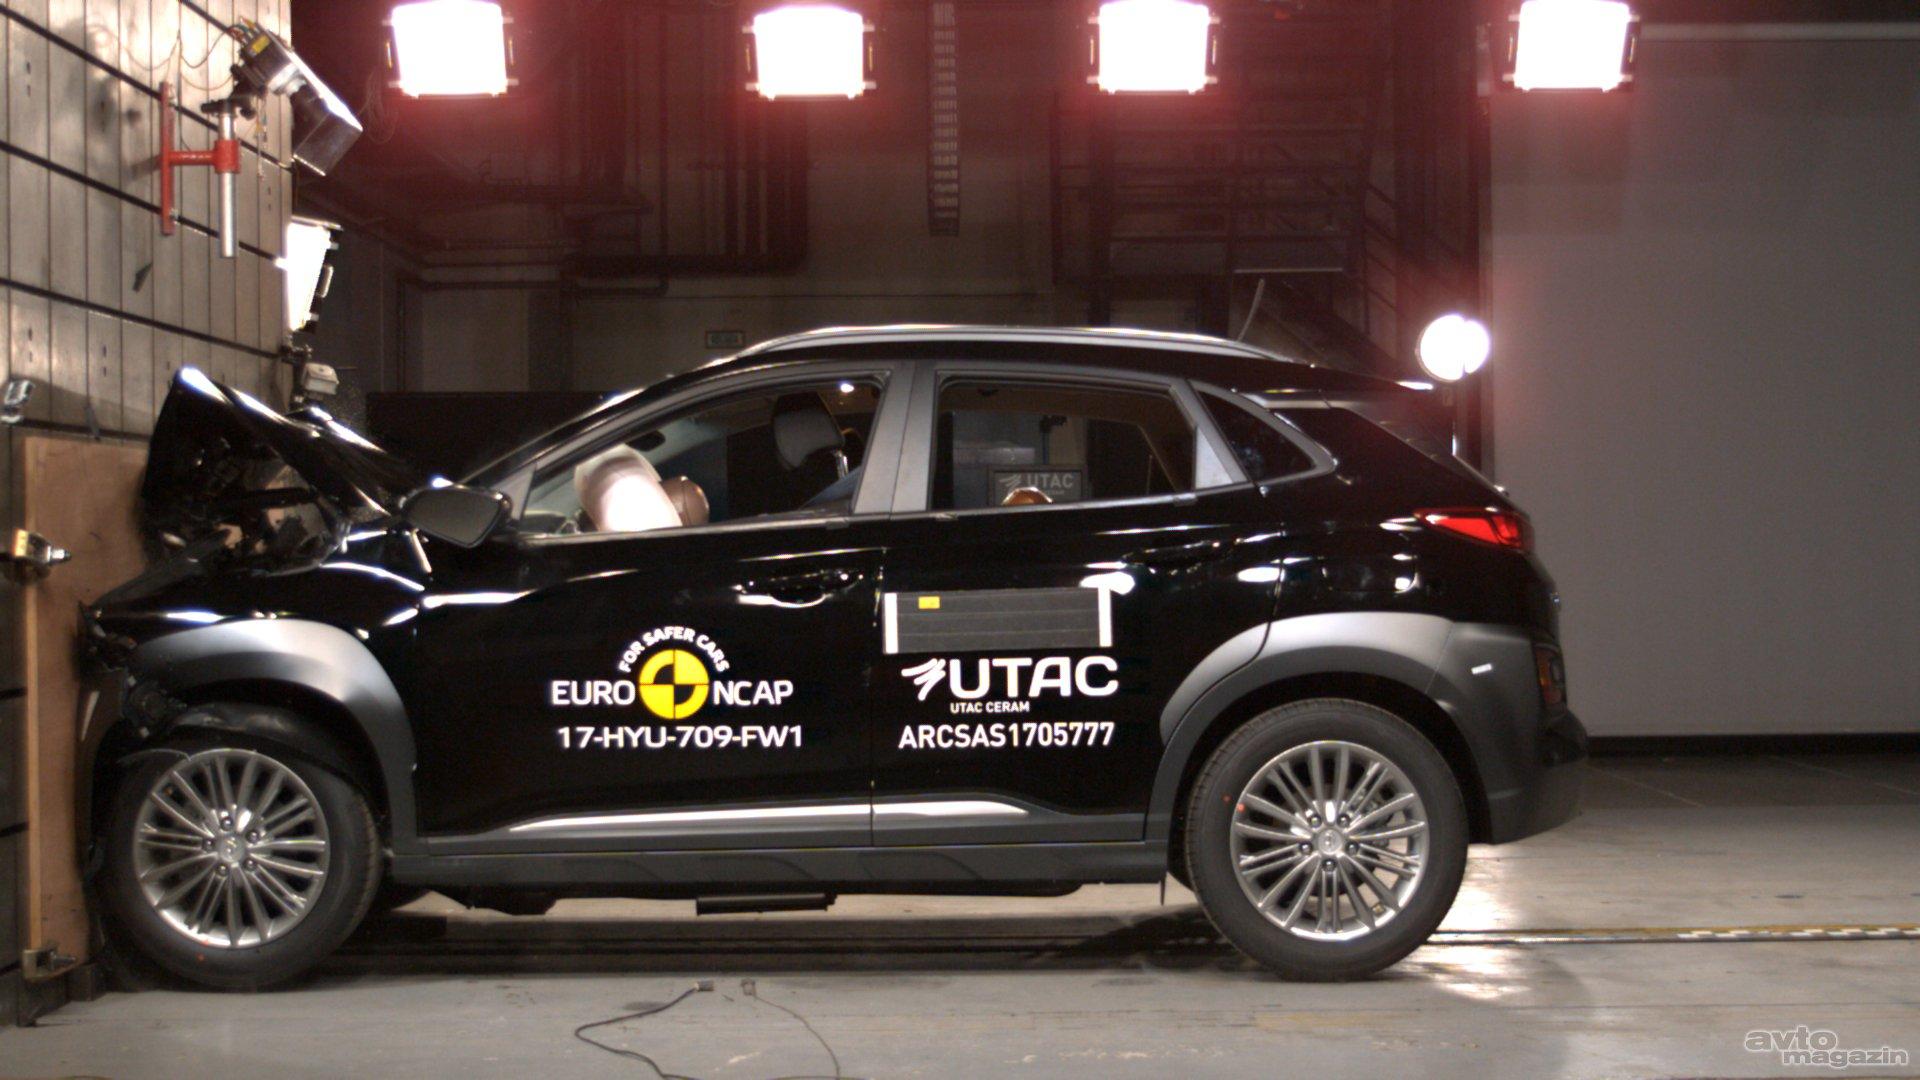 default three euroncap stars large duster ncap punto new fiat gets news safety euro test tests at s crash dacia